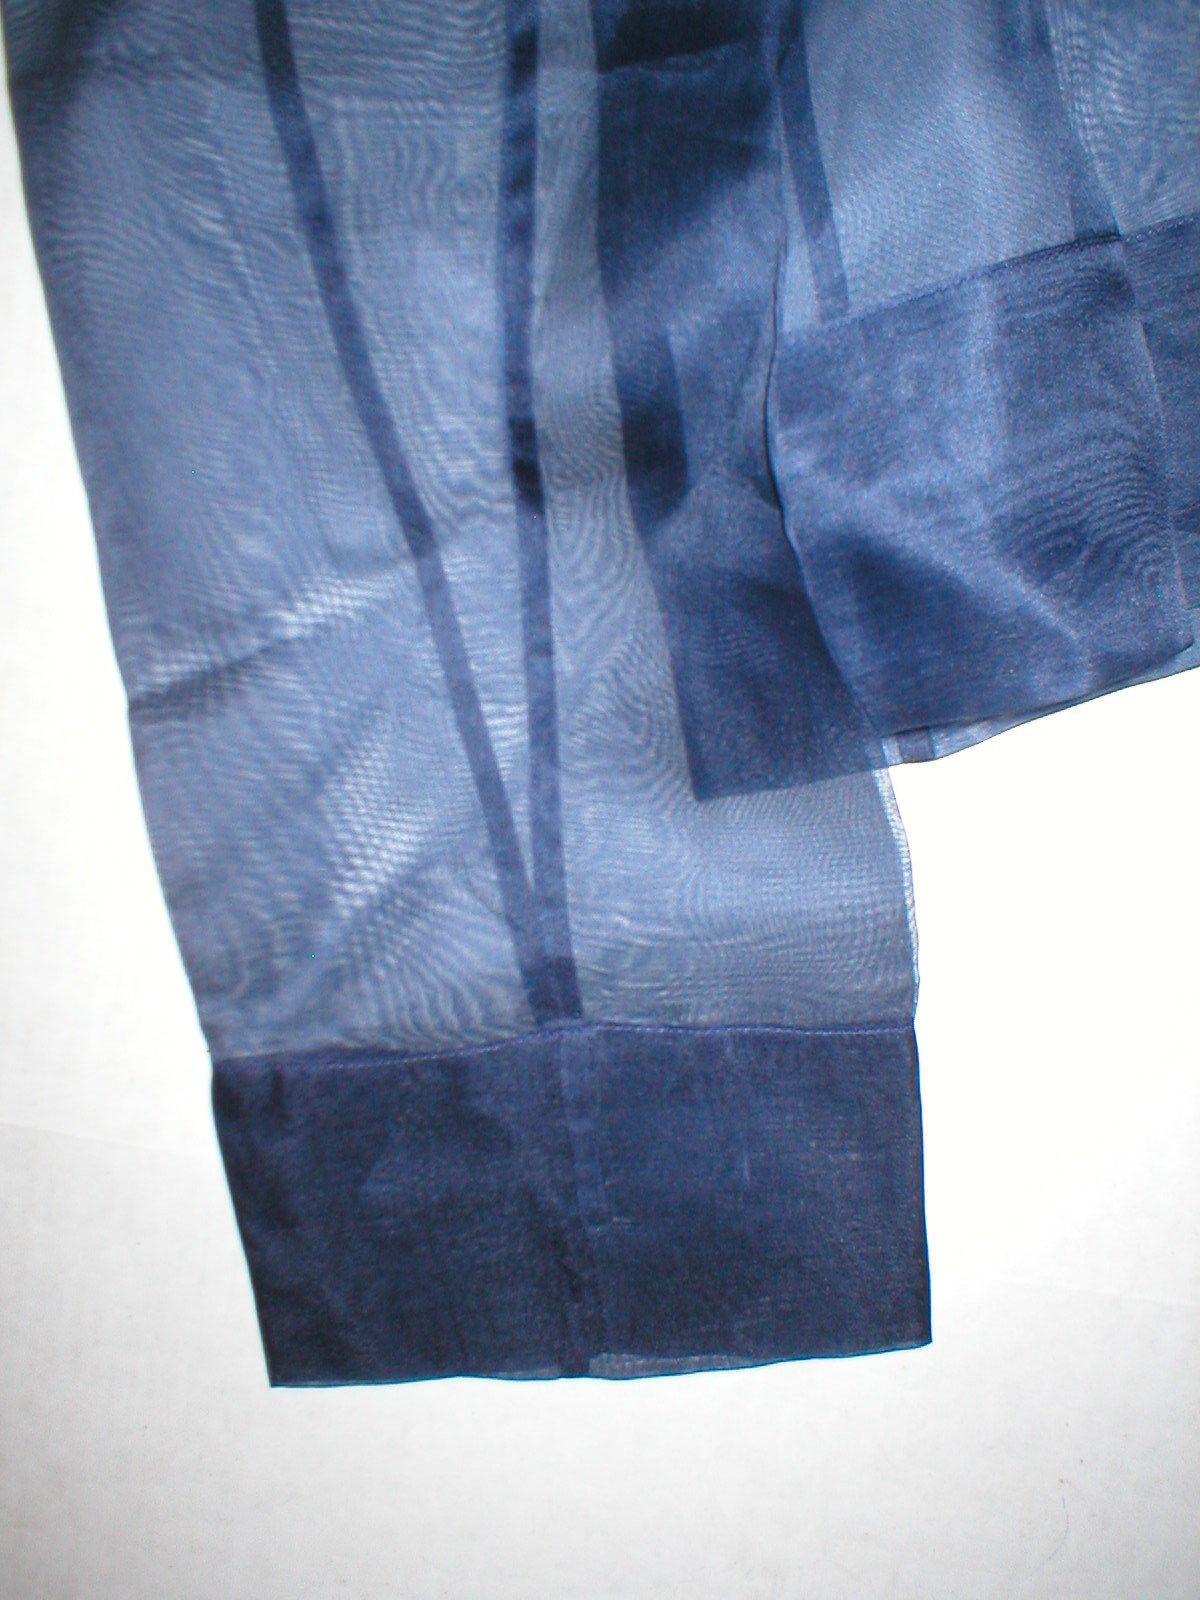 New NWT Womens 4 Blouse Top Designer Etro Silk LS Dark Blue Navy 40 Italy Sheer